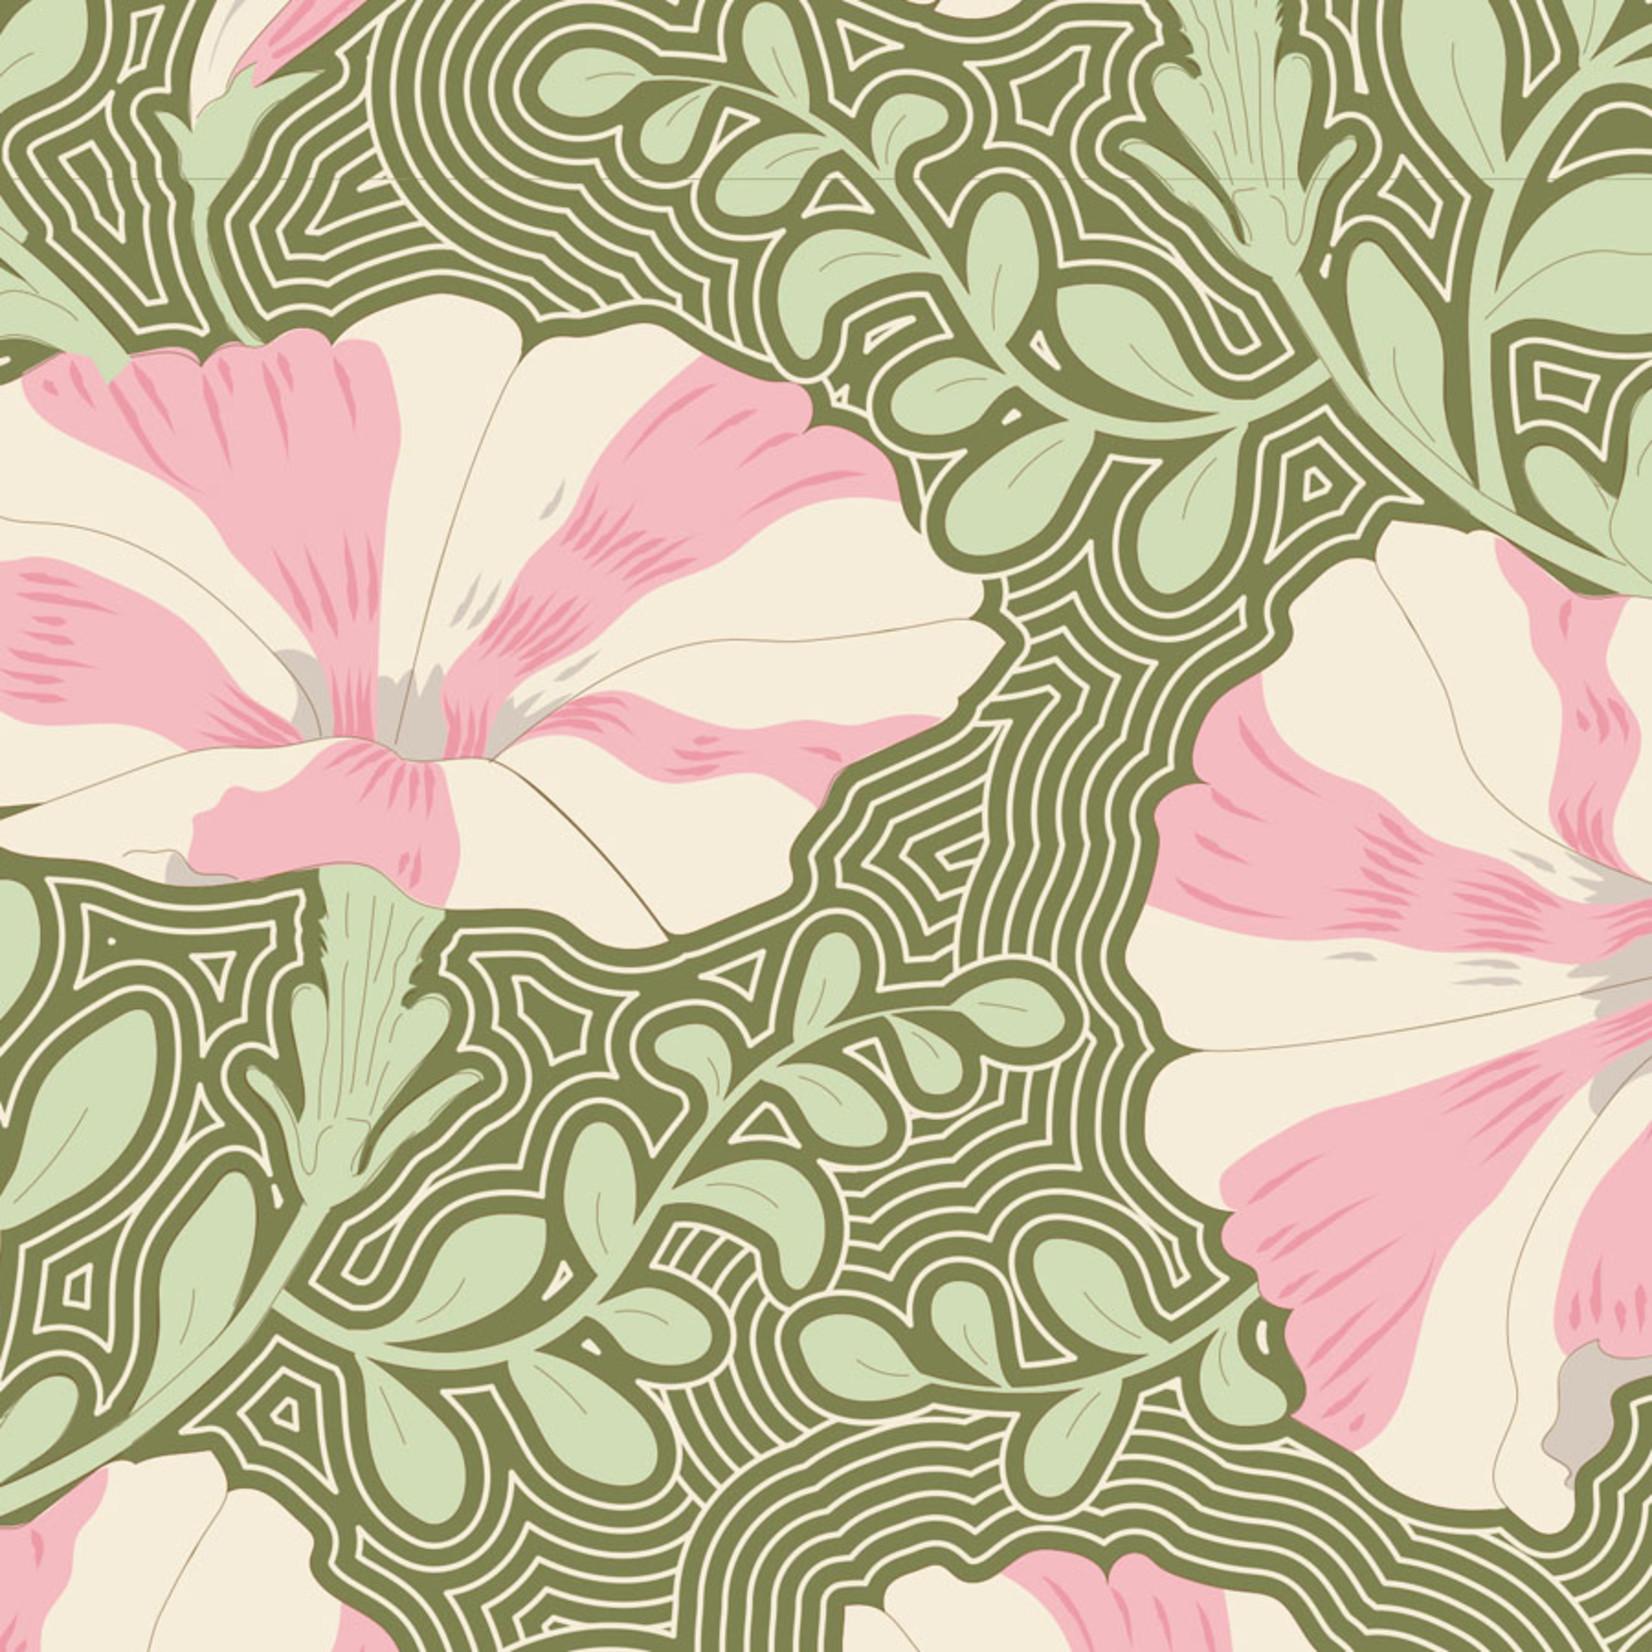 Tilda Gardenlife, Striped Petunia, Green 100313 $0.20 per cm or $20/m